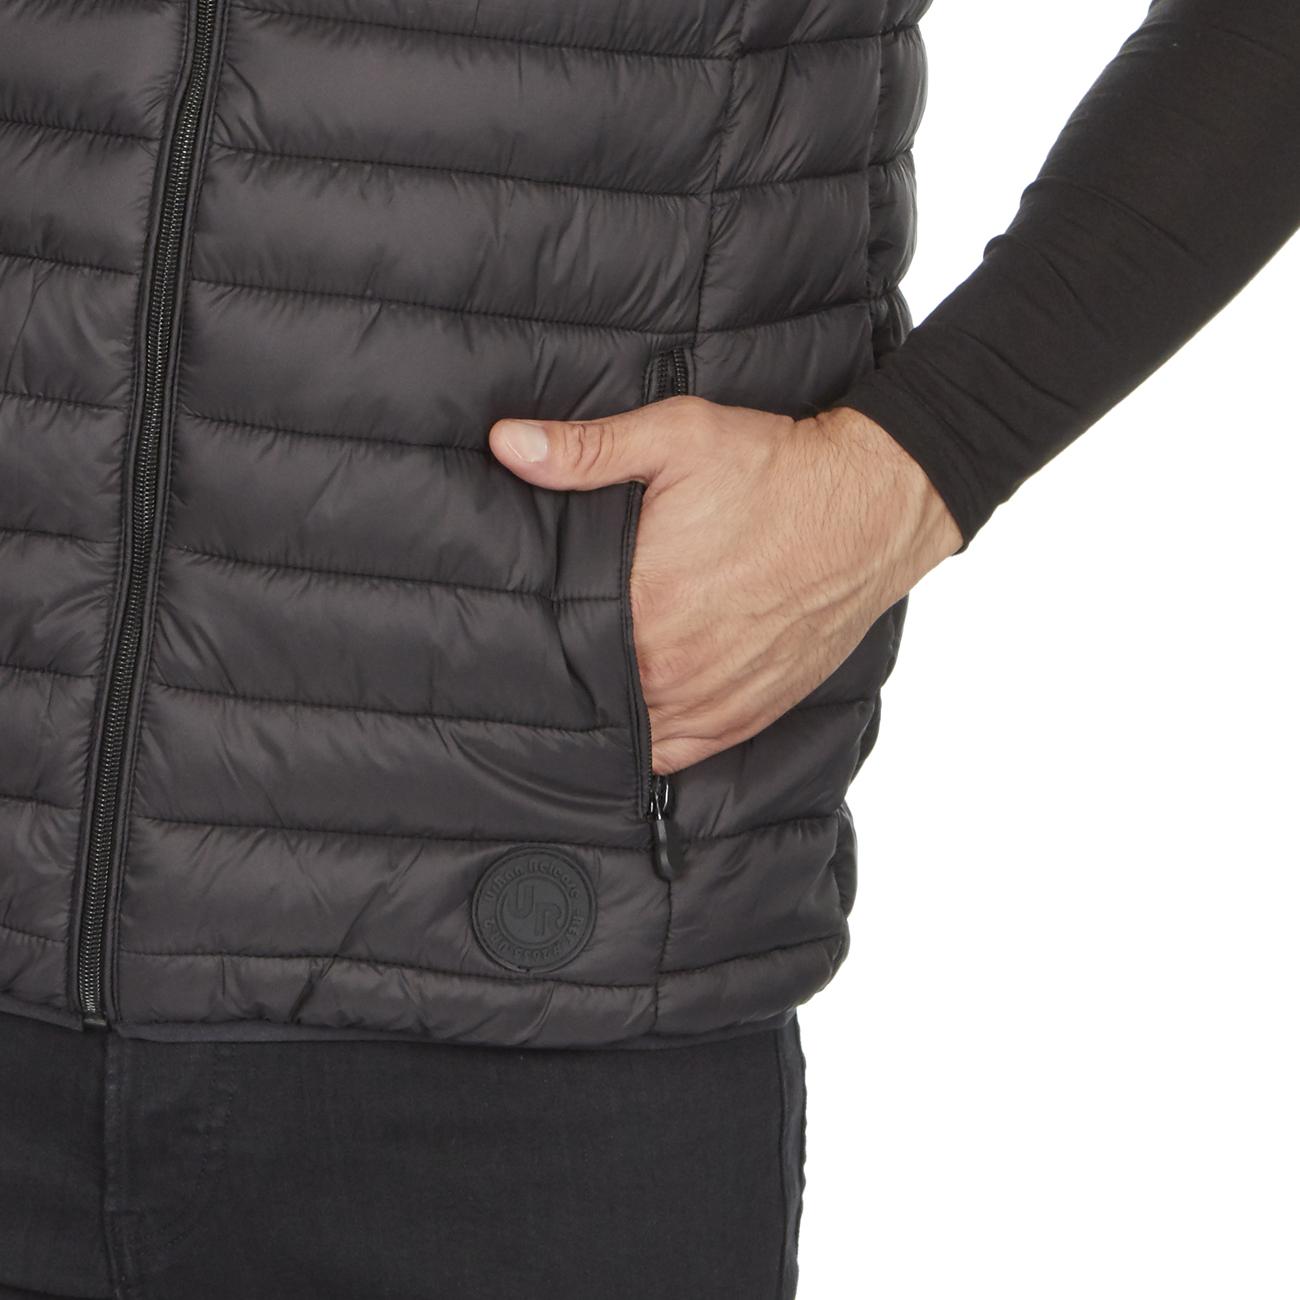 Mens-Padded-Vegan-Gilet-Bodywarmer-Windproof-Lightweight-Casual-Sleeveless-M-2XL thumbnail 5